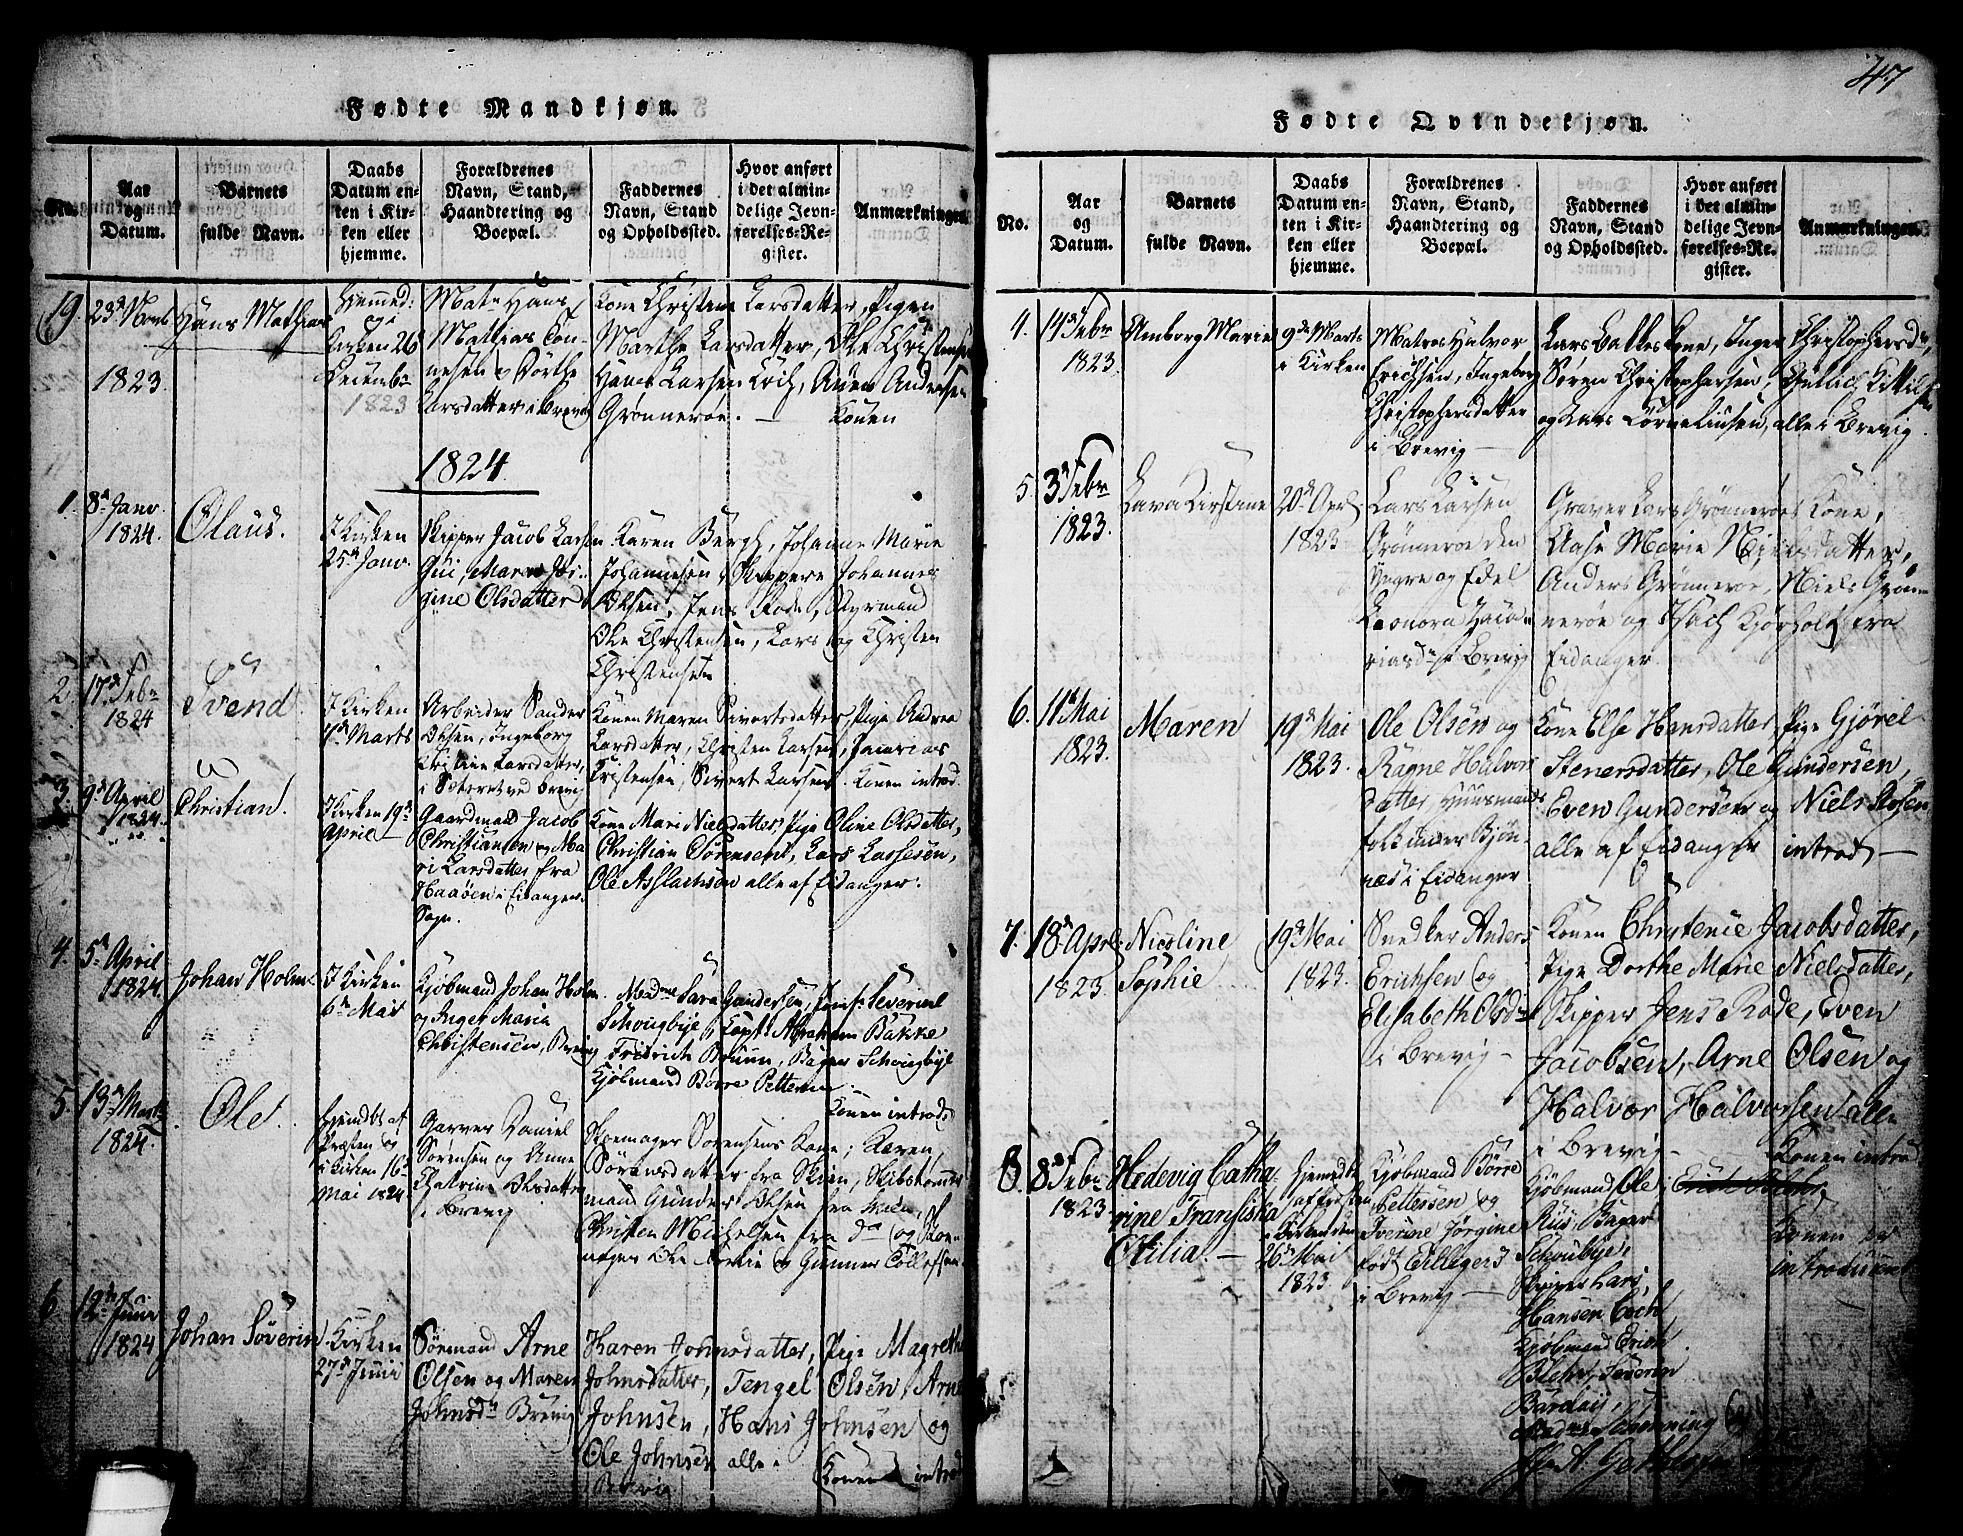 SAKO, Brevik kirkebøker, G/Ga/L0001: Klokkerbok nr. 1, 1814-1845, s. 47